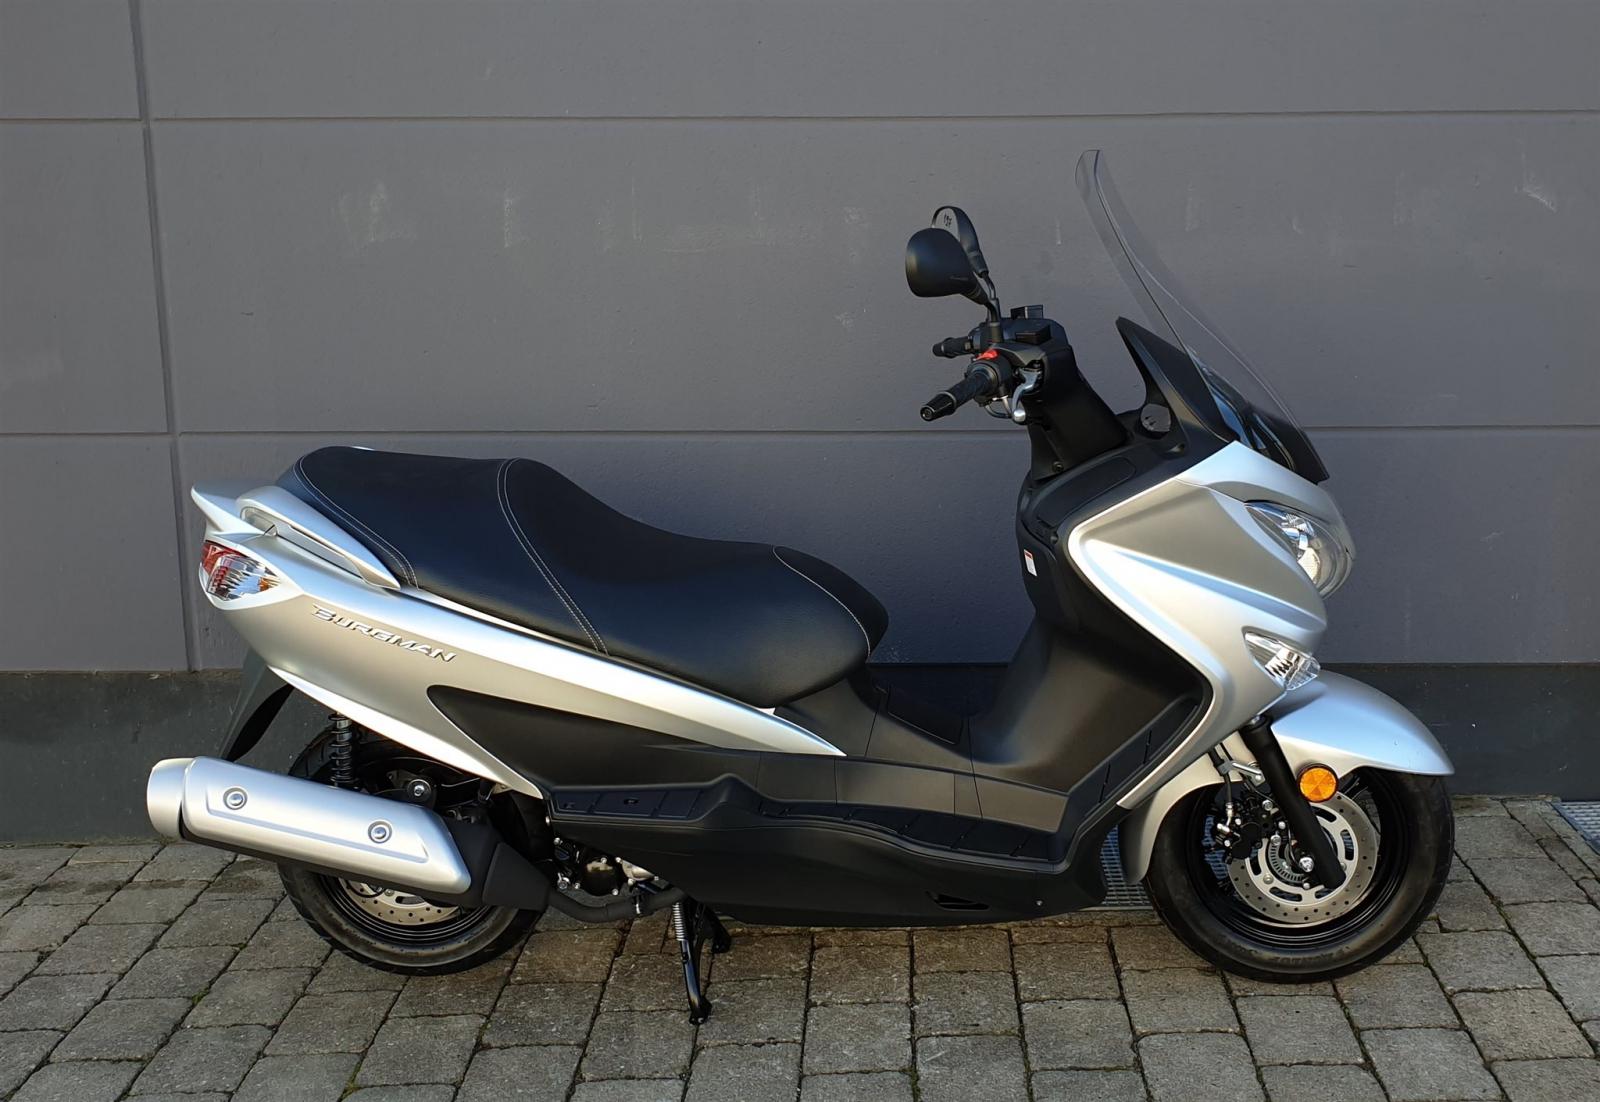 Suzuki Burgman 125, Sofort lieferbar!!! Tageszulassung!!!